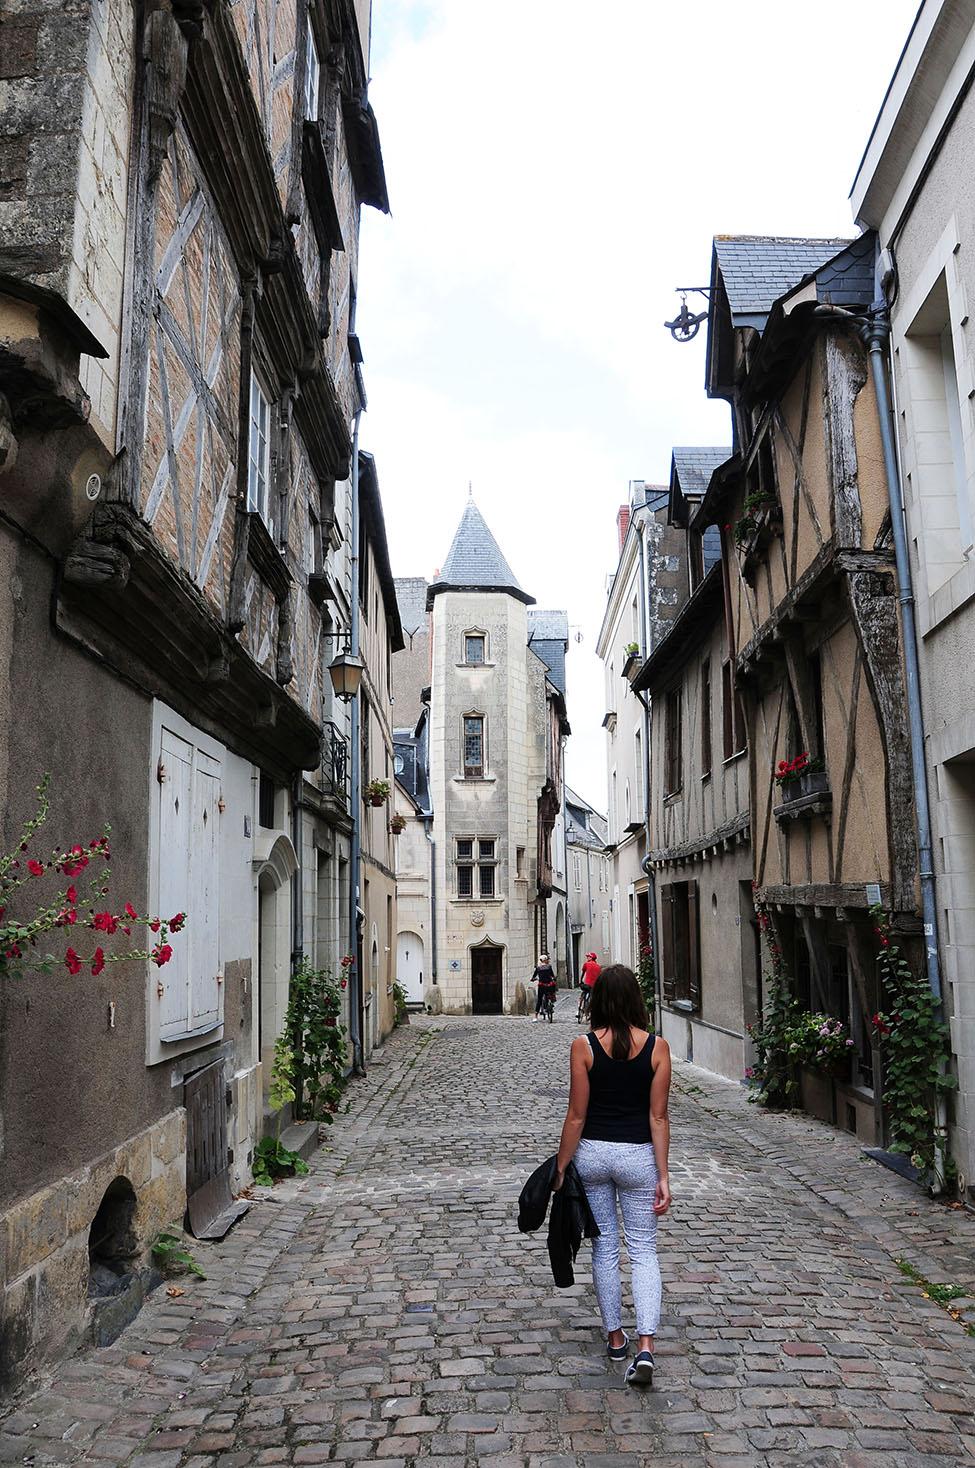 rue saint-aignans, angers